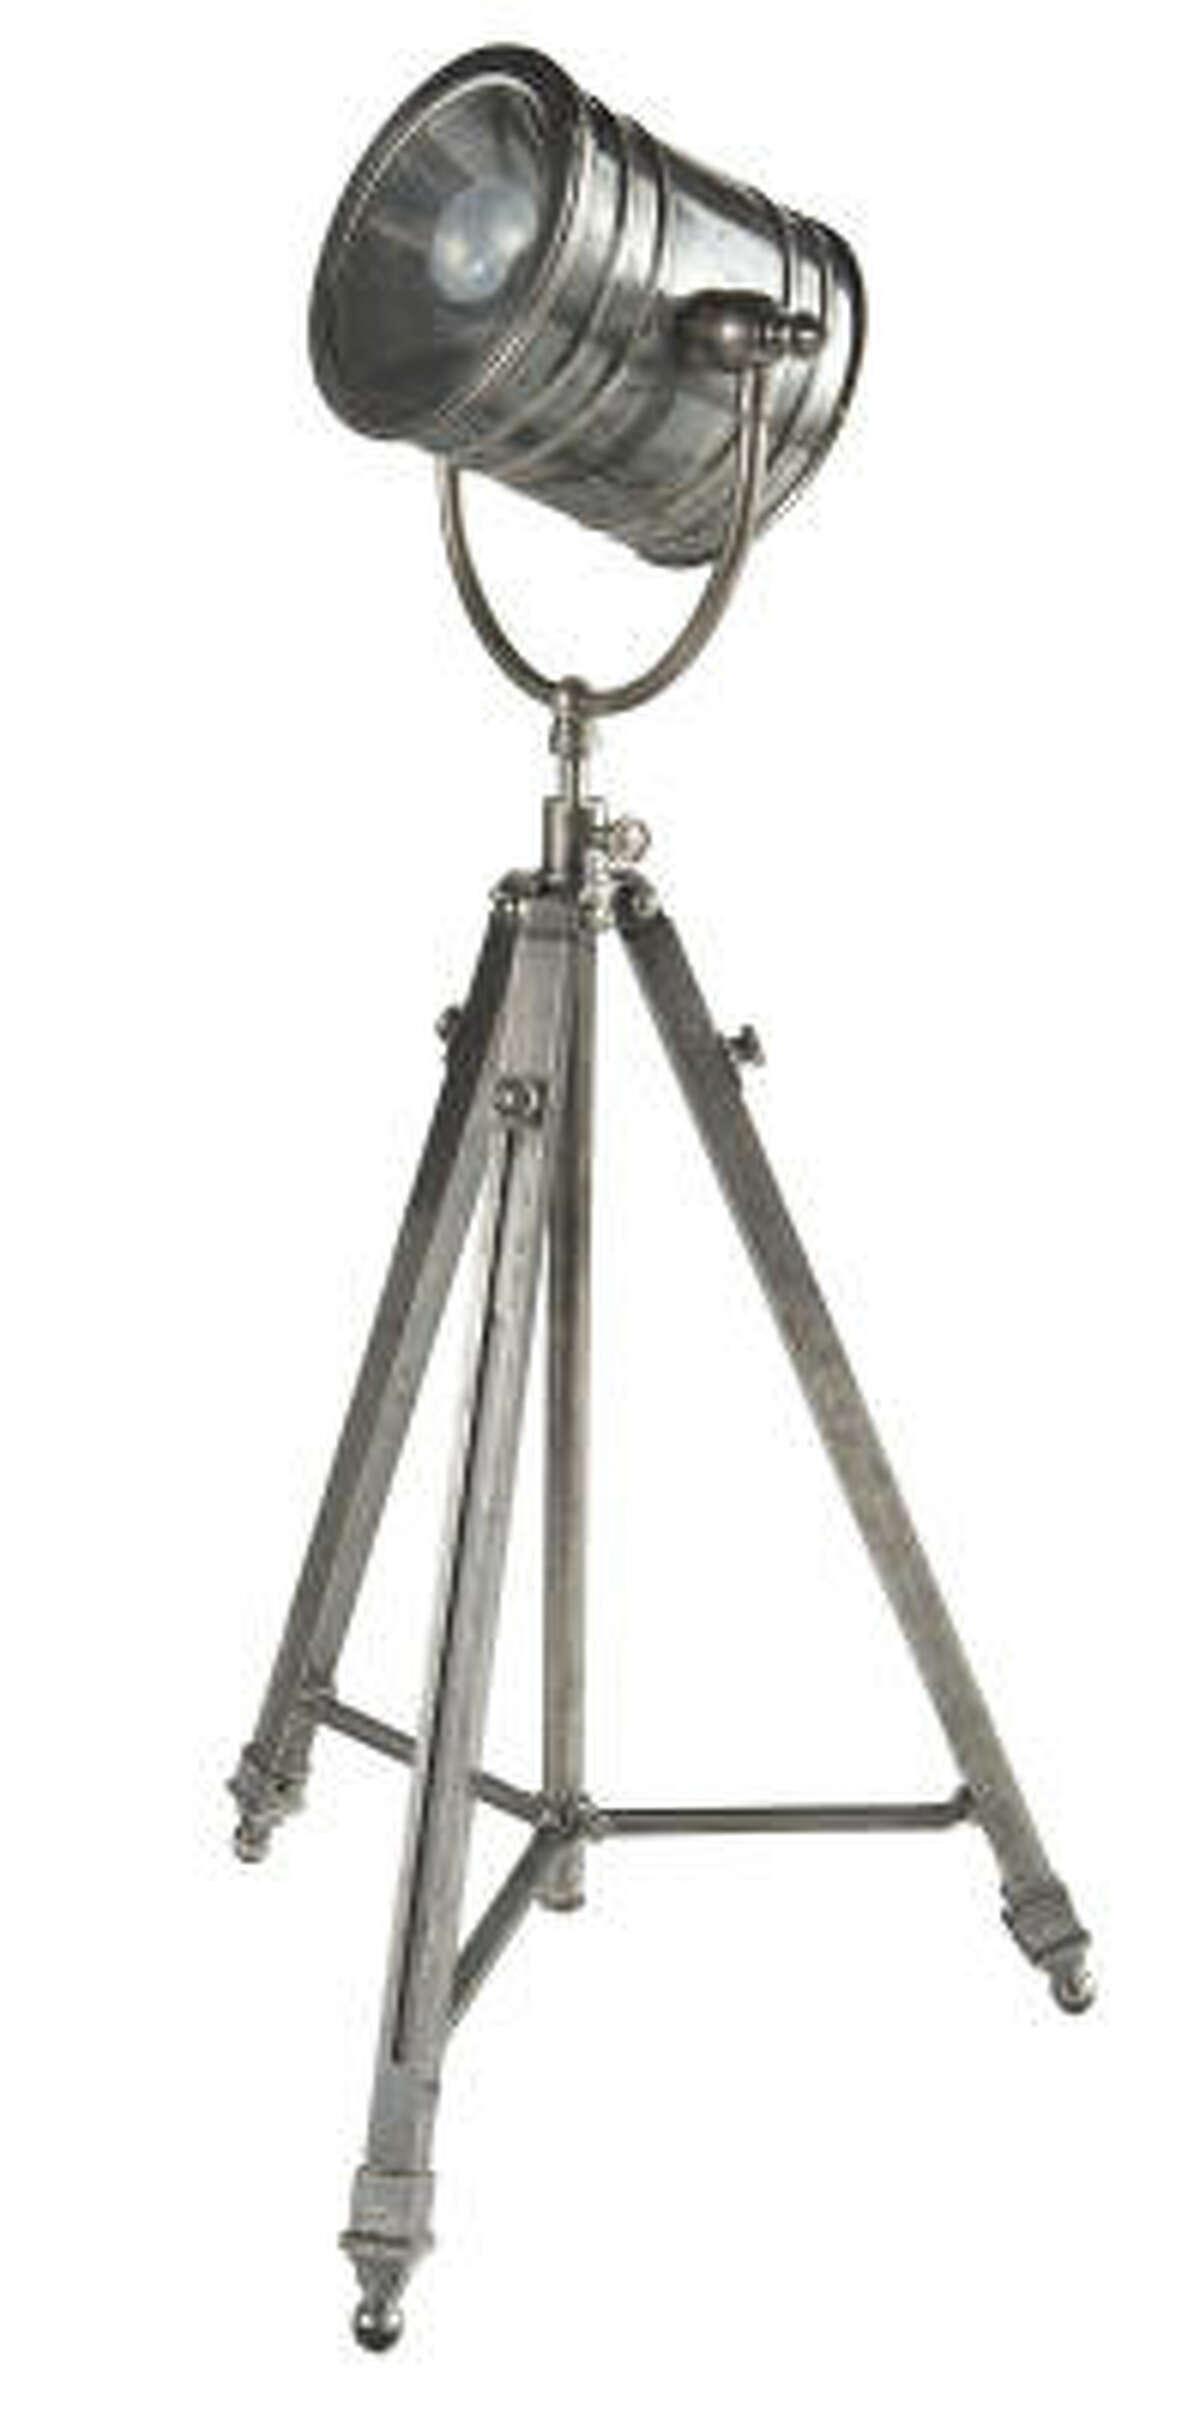 Antiqued Metal Tripod Lamp, $449, Wisteria.com